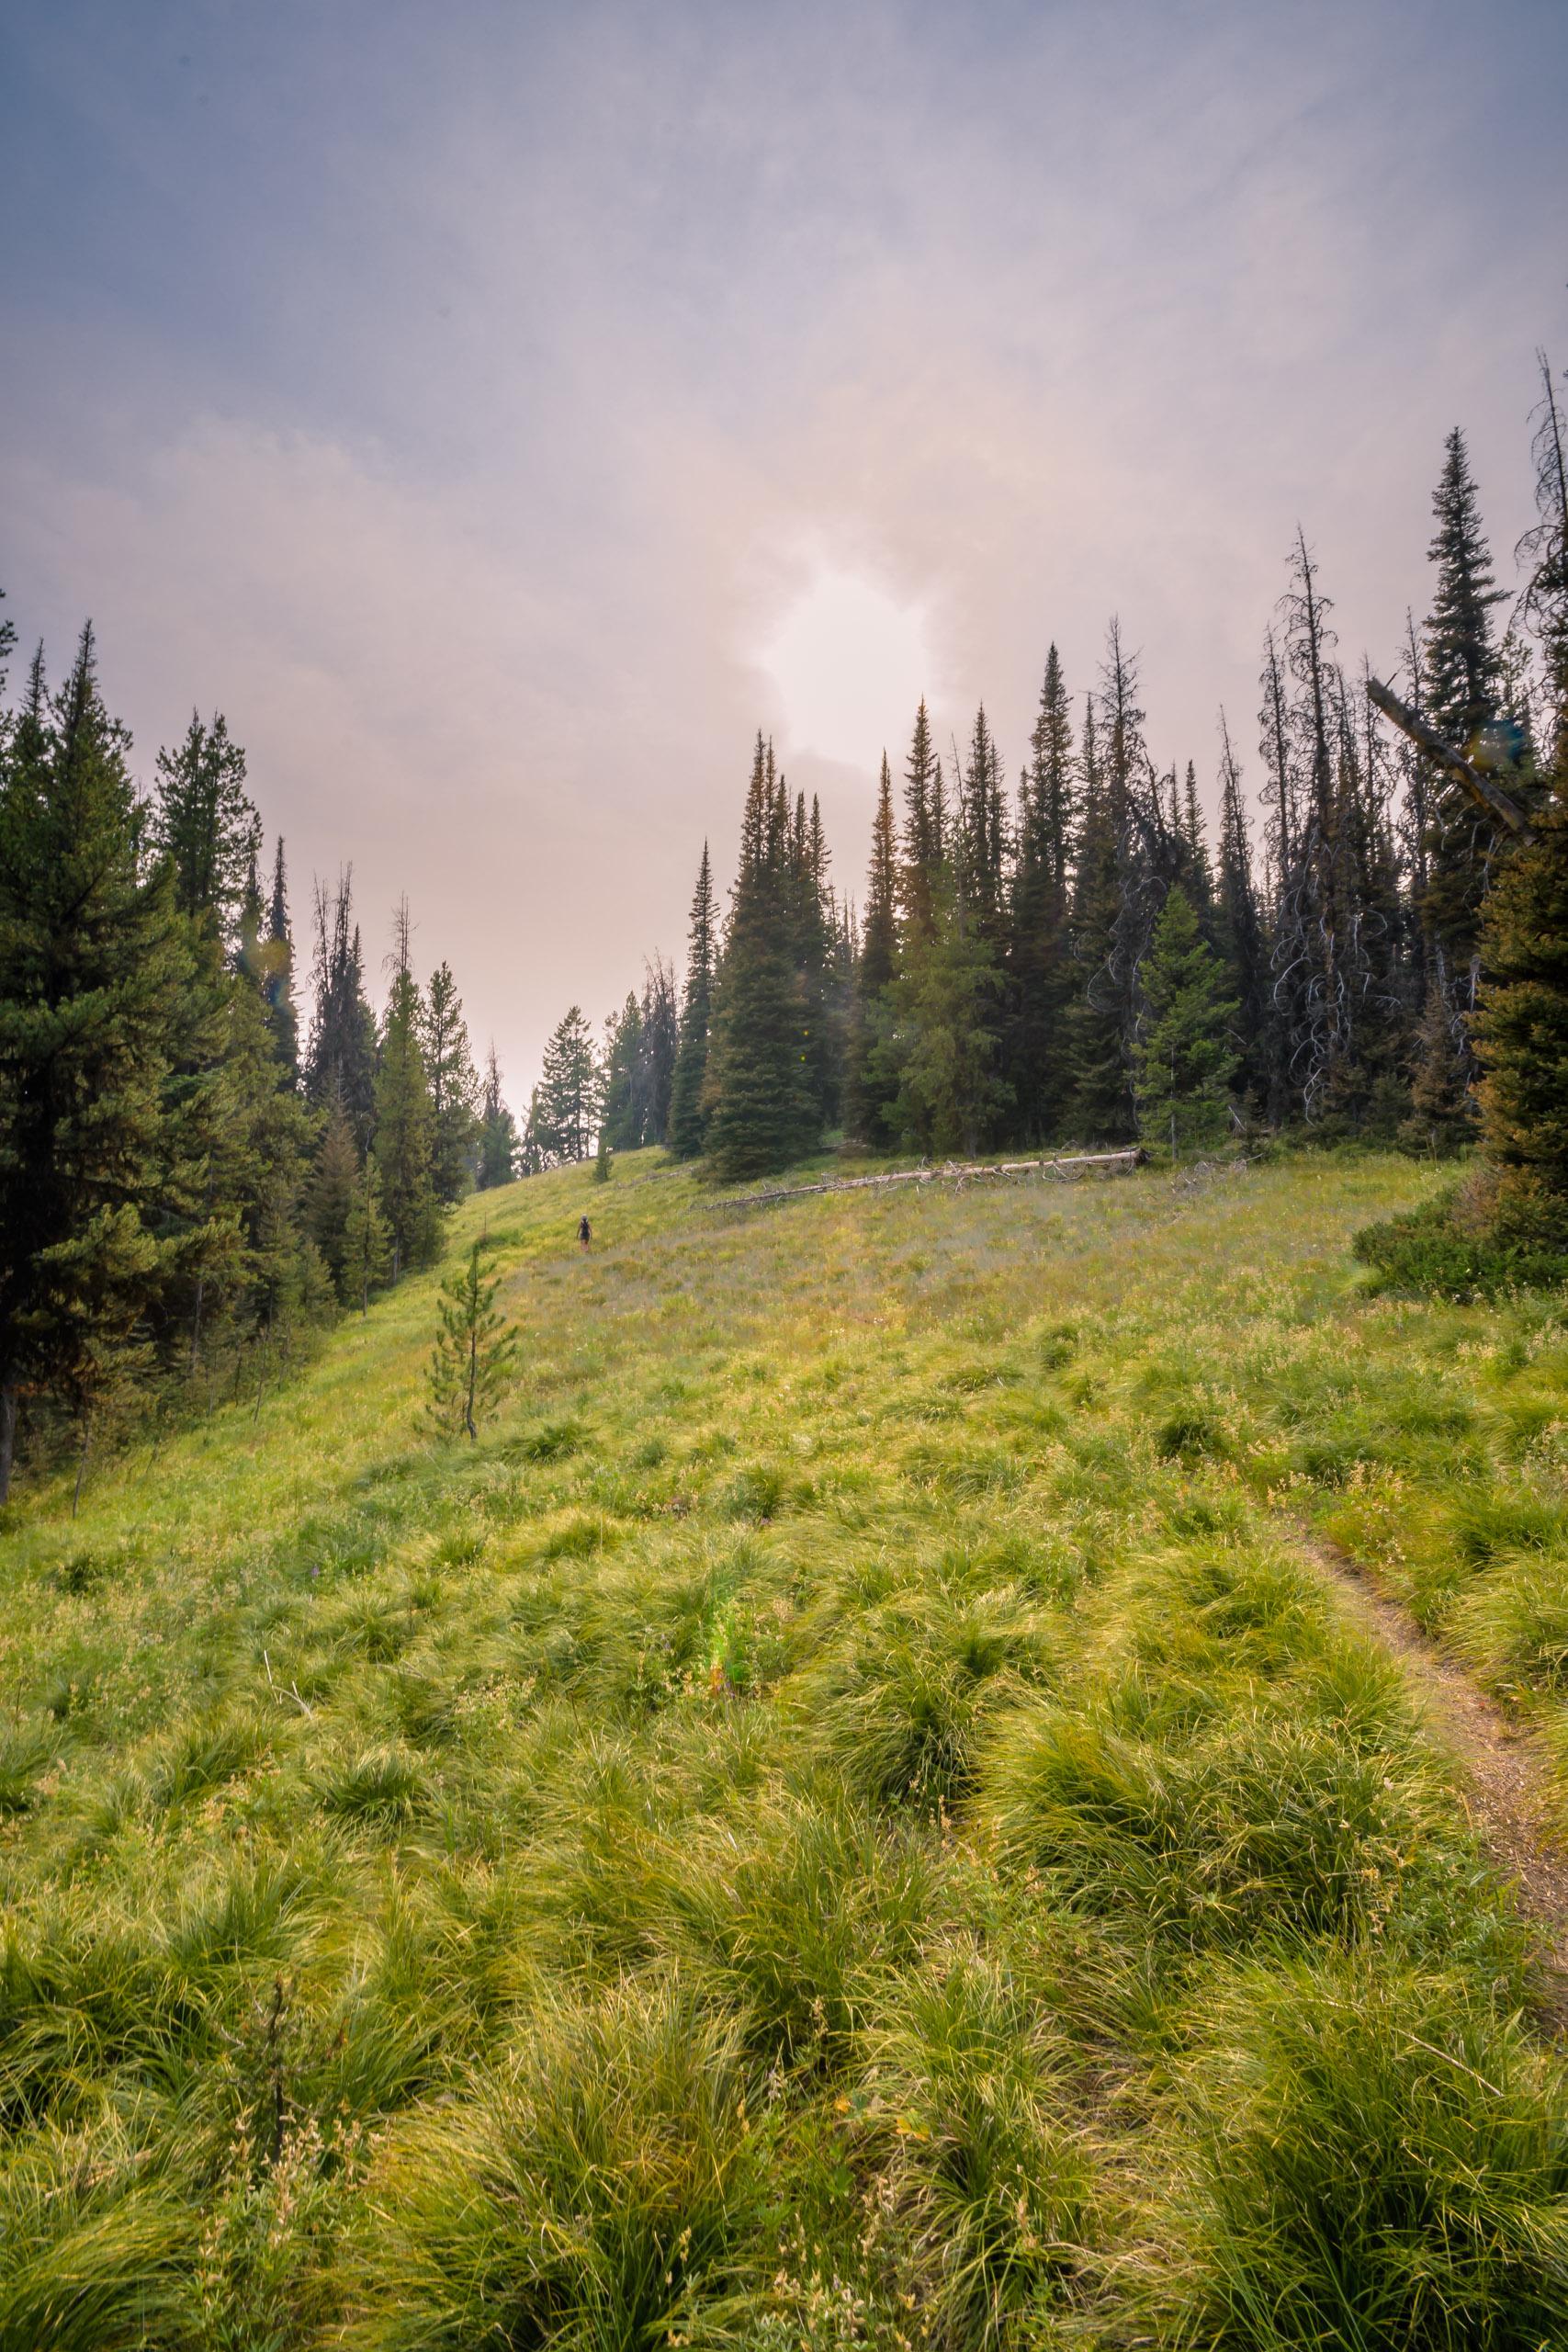 Vida approaching the timbered ridge